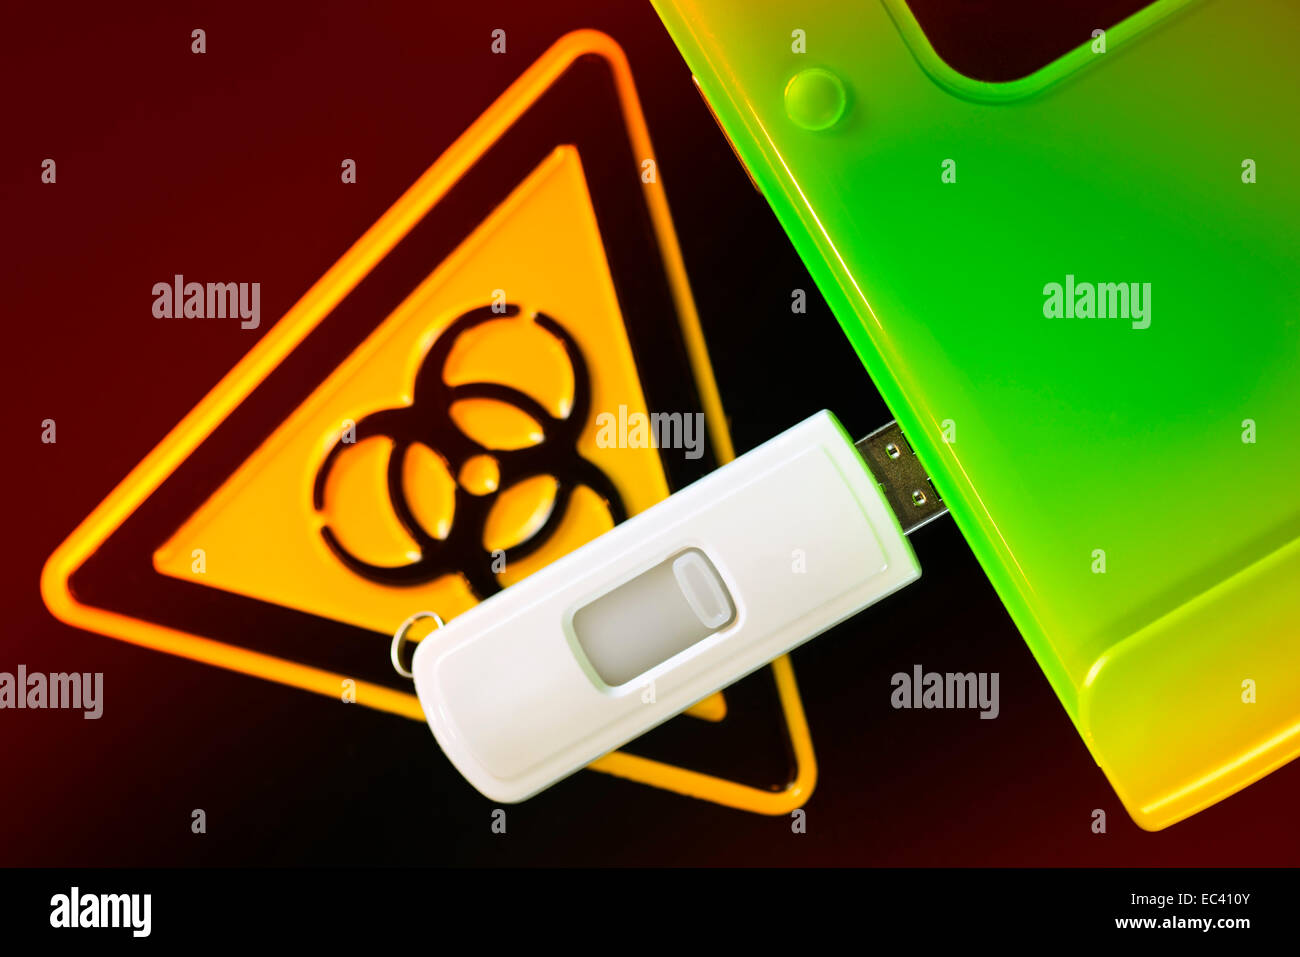 USB flash drive and biohazard sign, computer virus - Stock Image